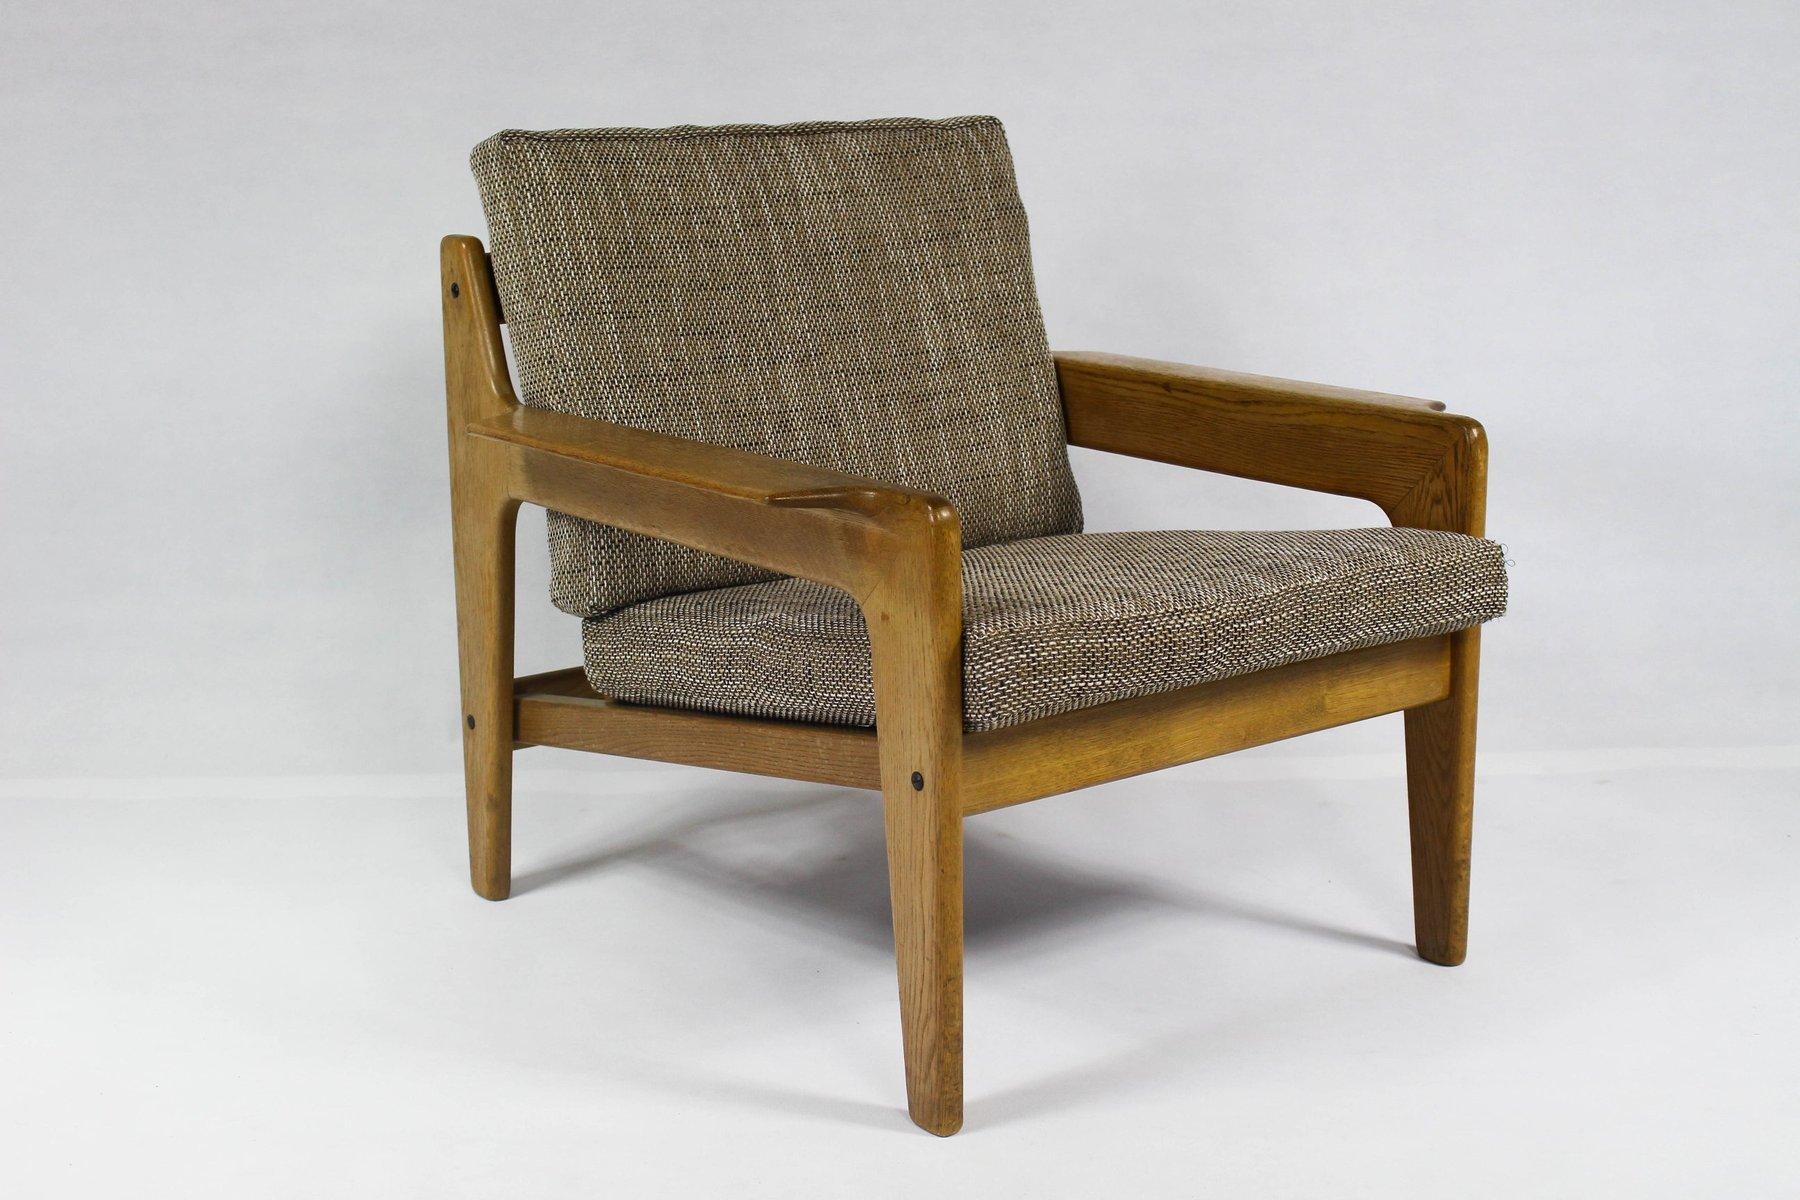 Vintage Danish Lounge Chair By Arne Wahl Iversen For Komfort